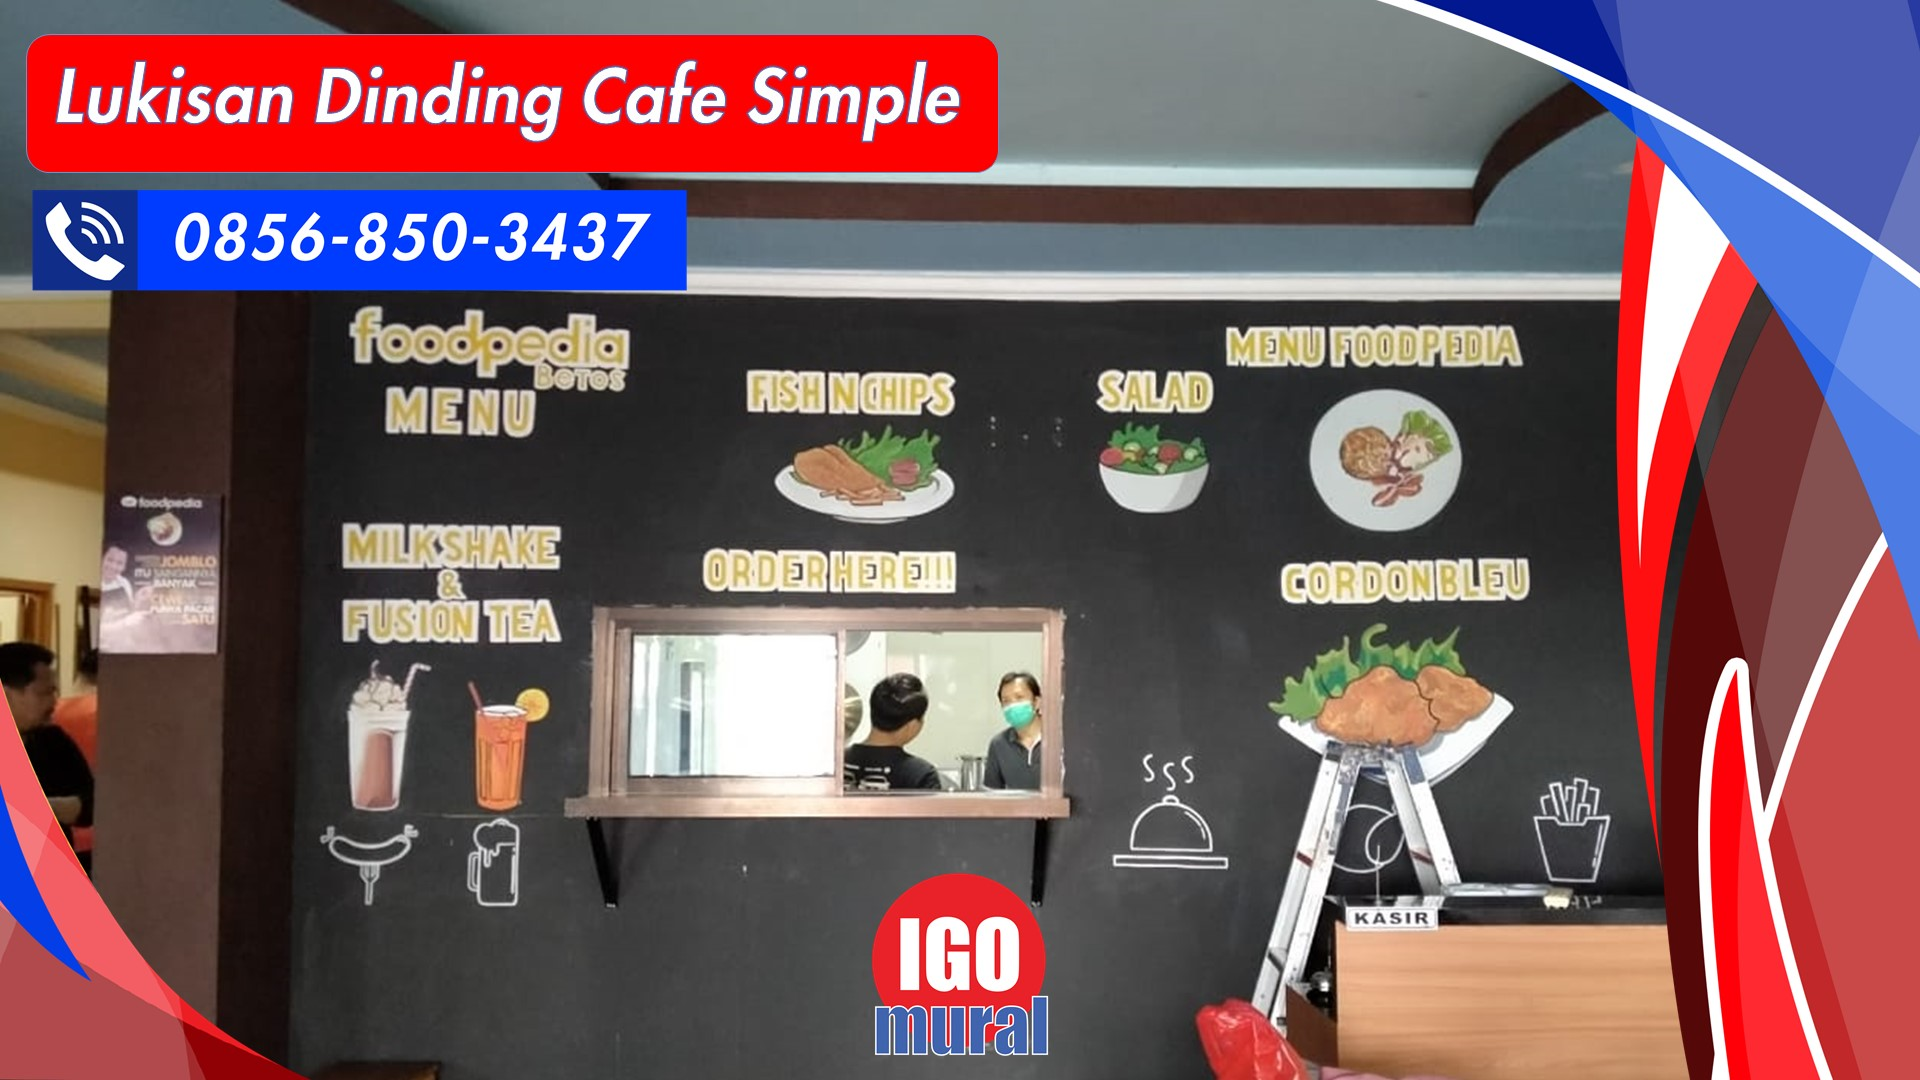 Lukisan dinding cafe simple